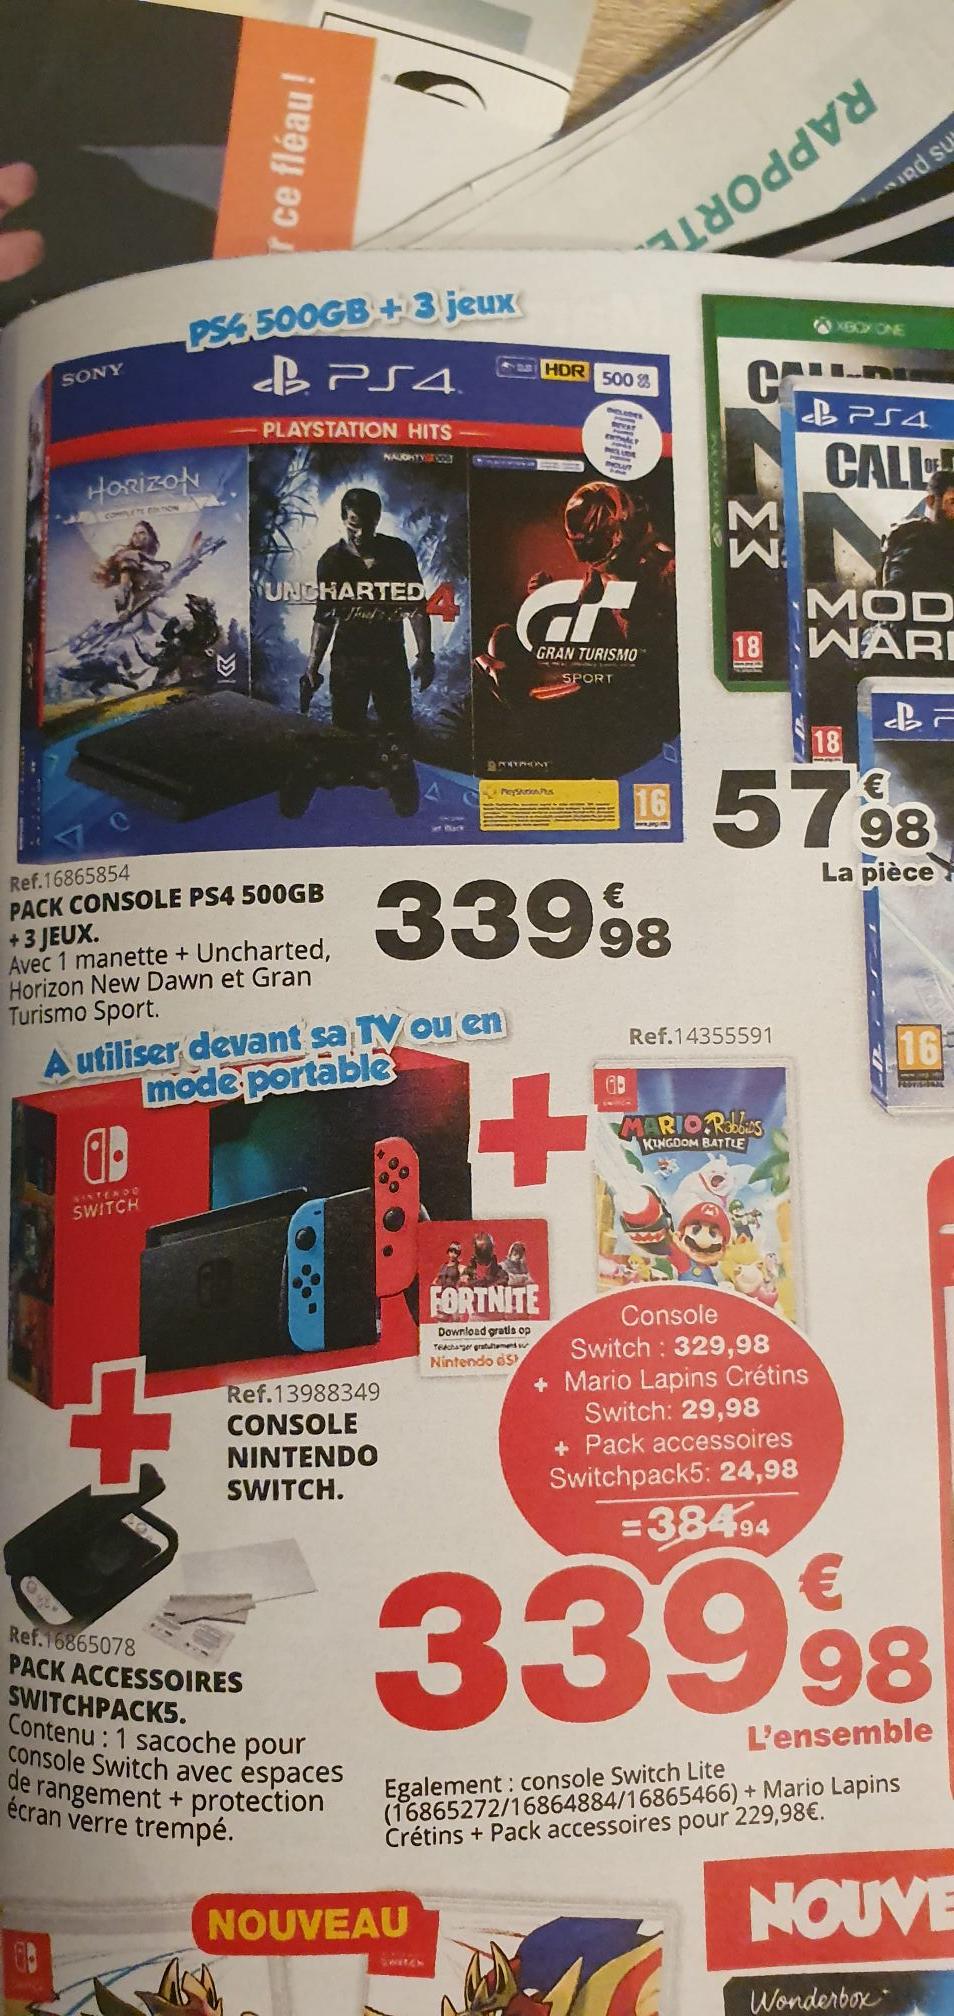 Pack console Nintendo Switch + Mario & les Lapins crétins + Pack accessoires